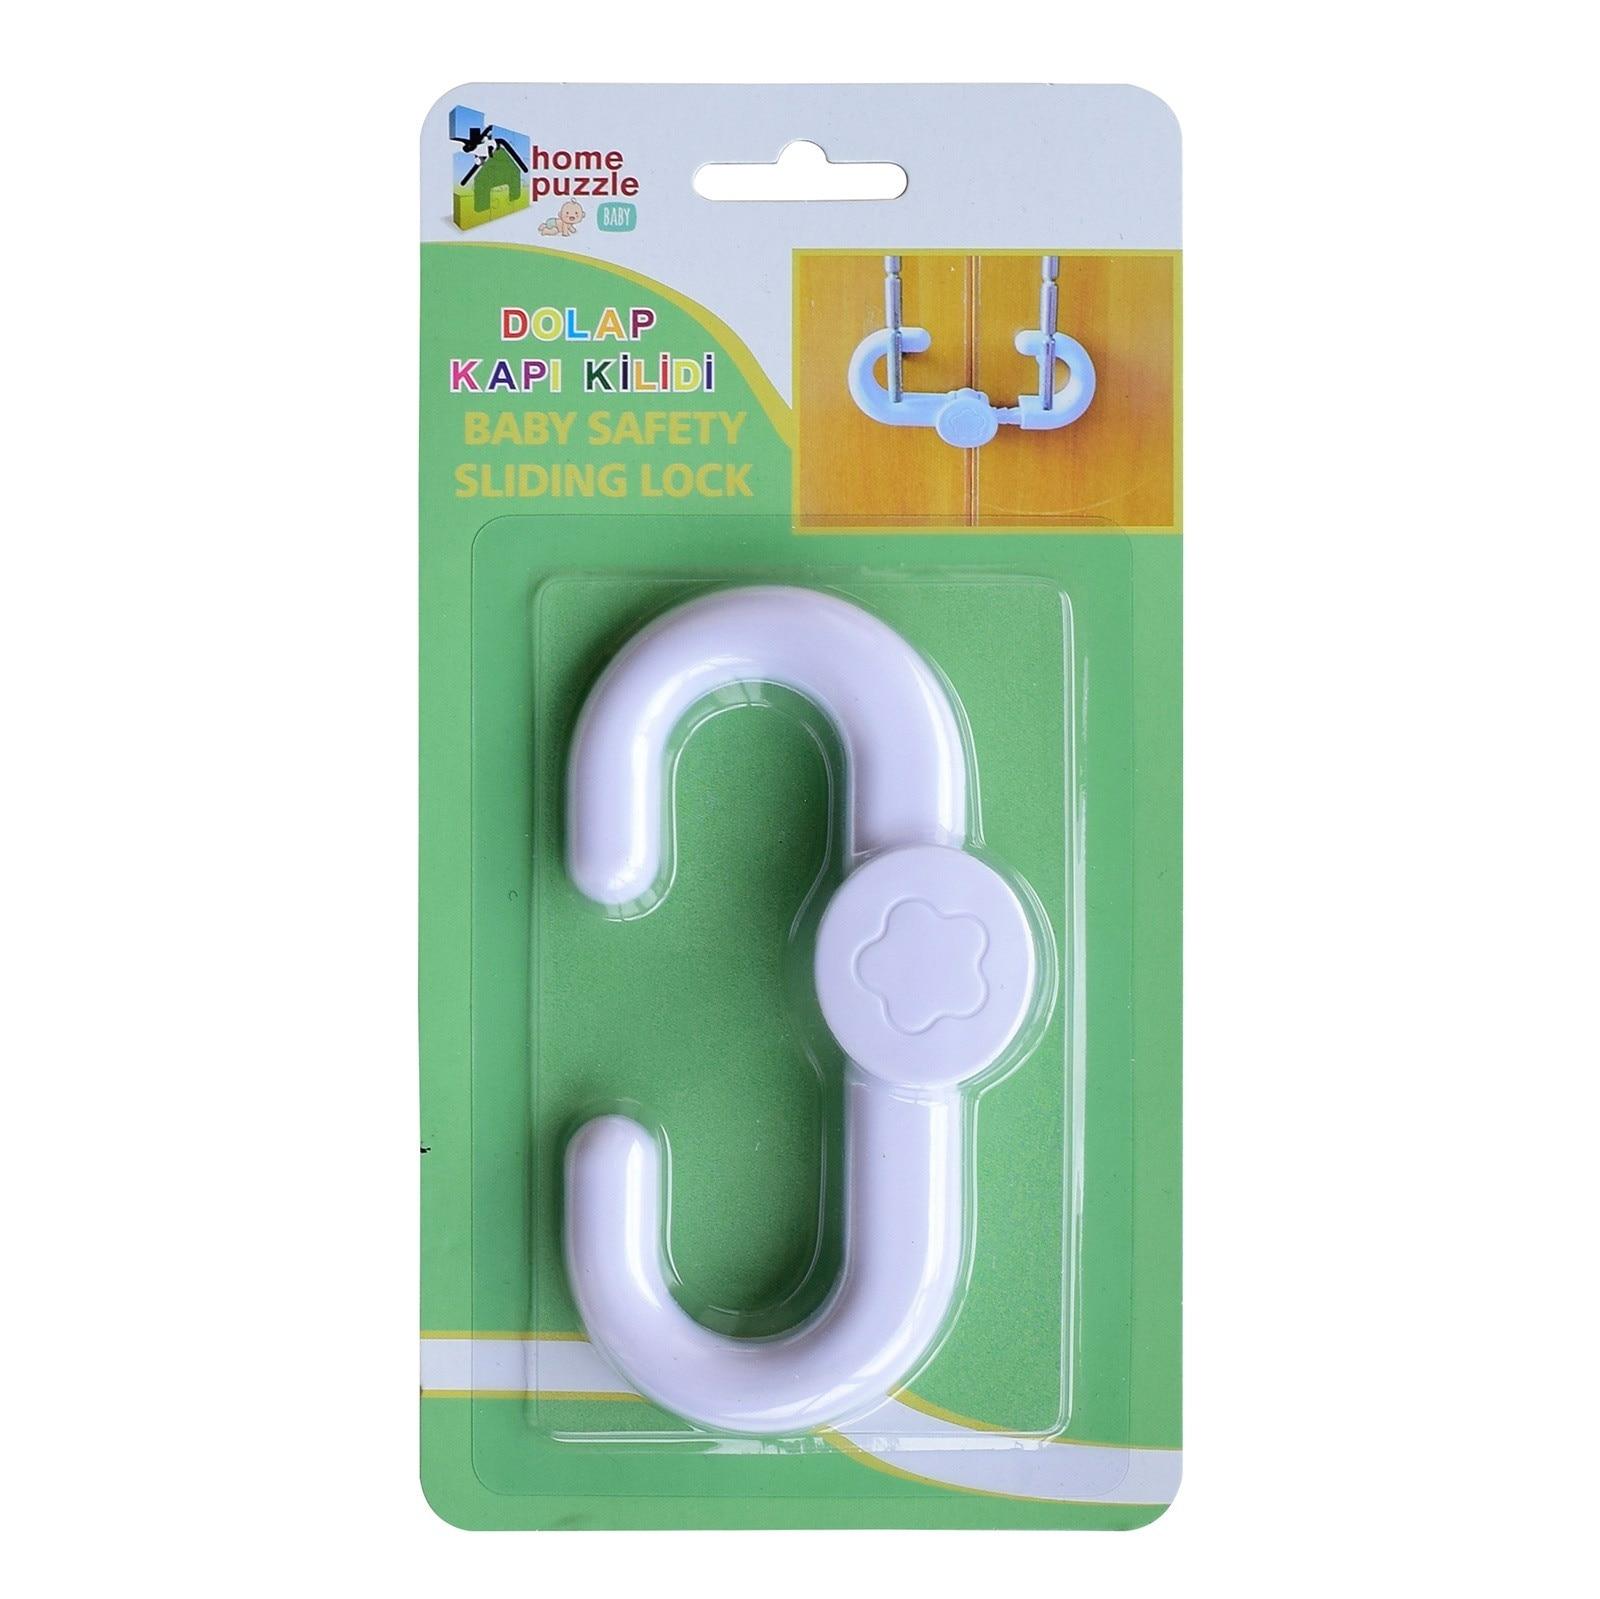 Ebebek Homepuzzle Baby Safety Sliding Lock